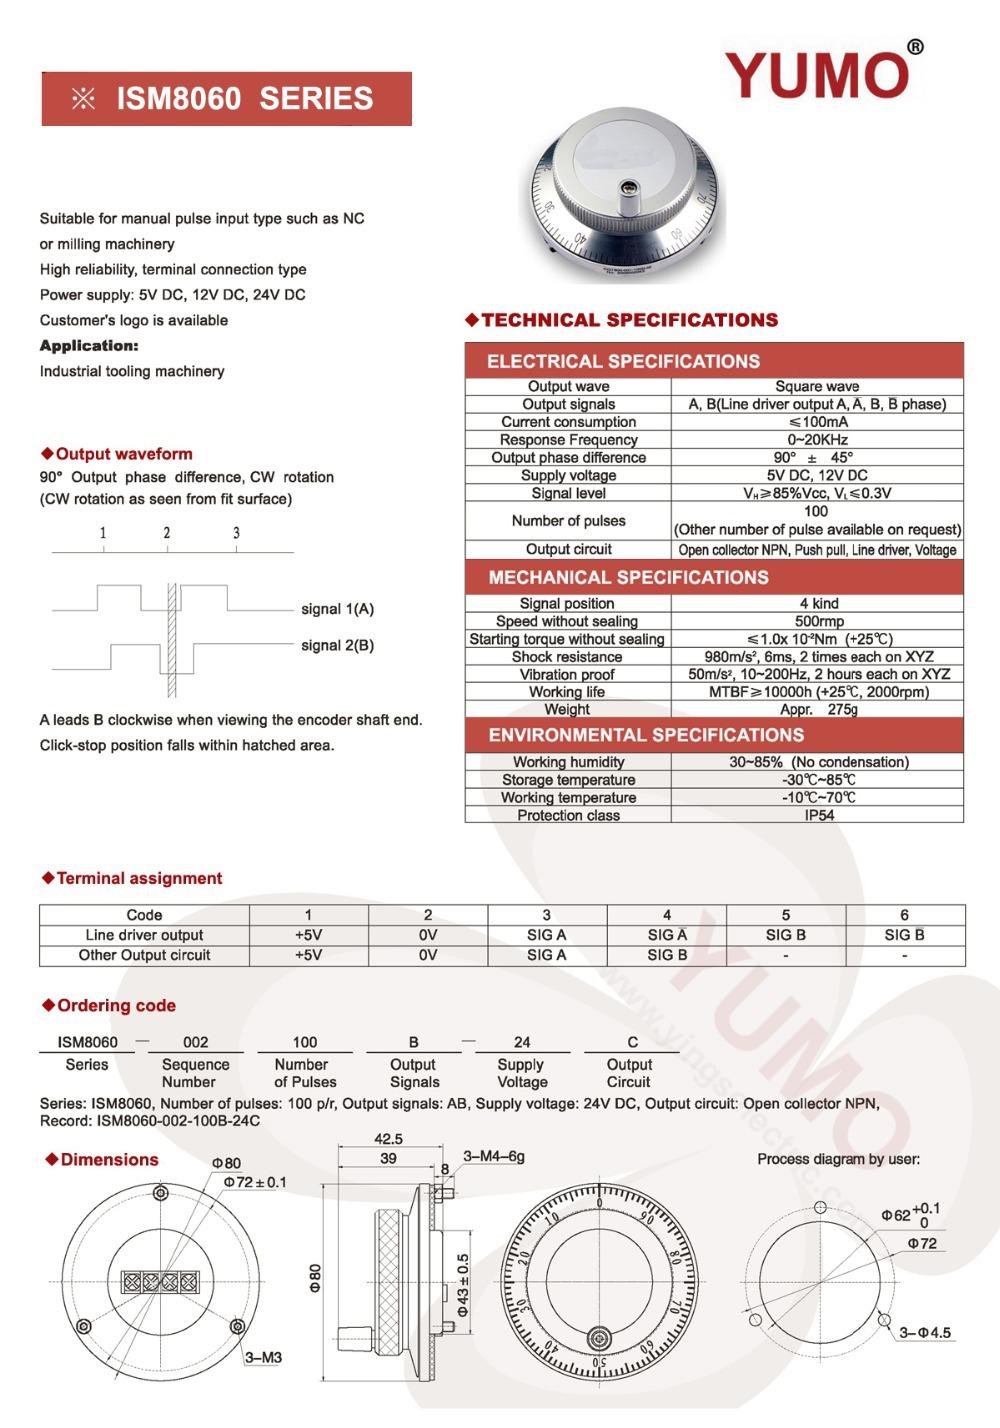 Taig micro mill & micro lathe mach3 setup for cnc.